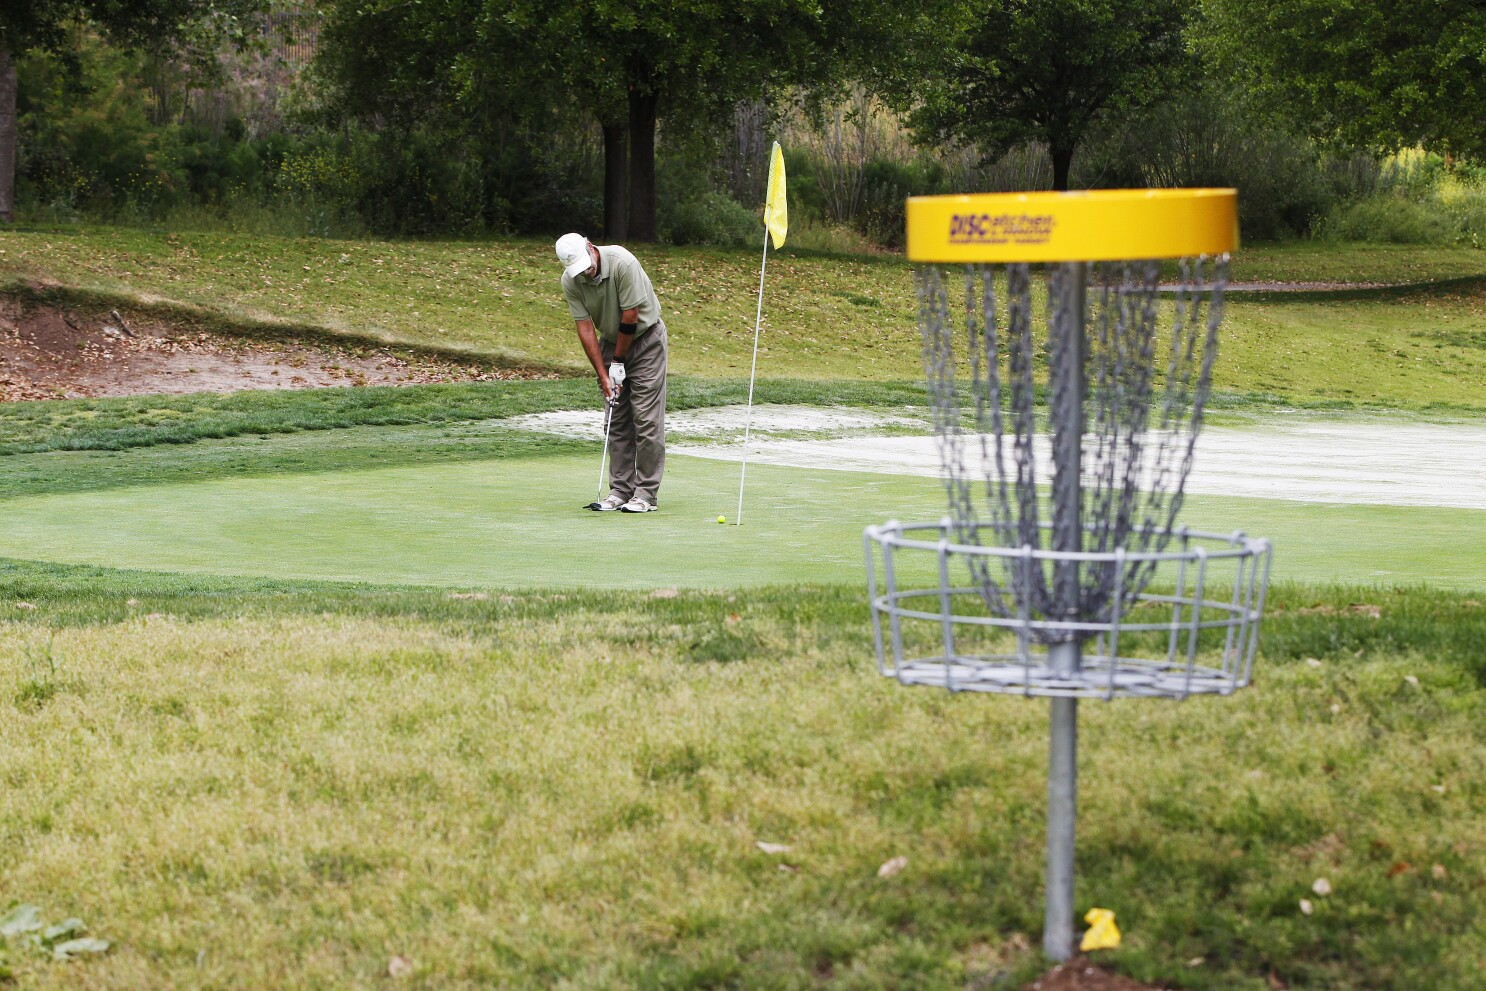 Disc Golf To Debut Saturday At Reidy Creek The San Diego Union Tribune